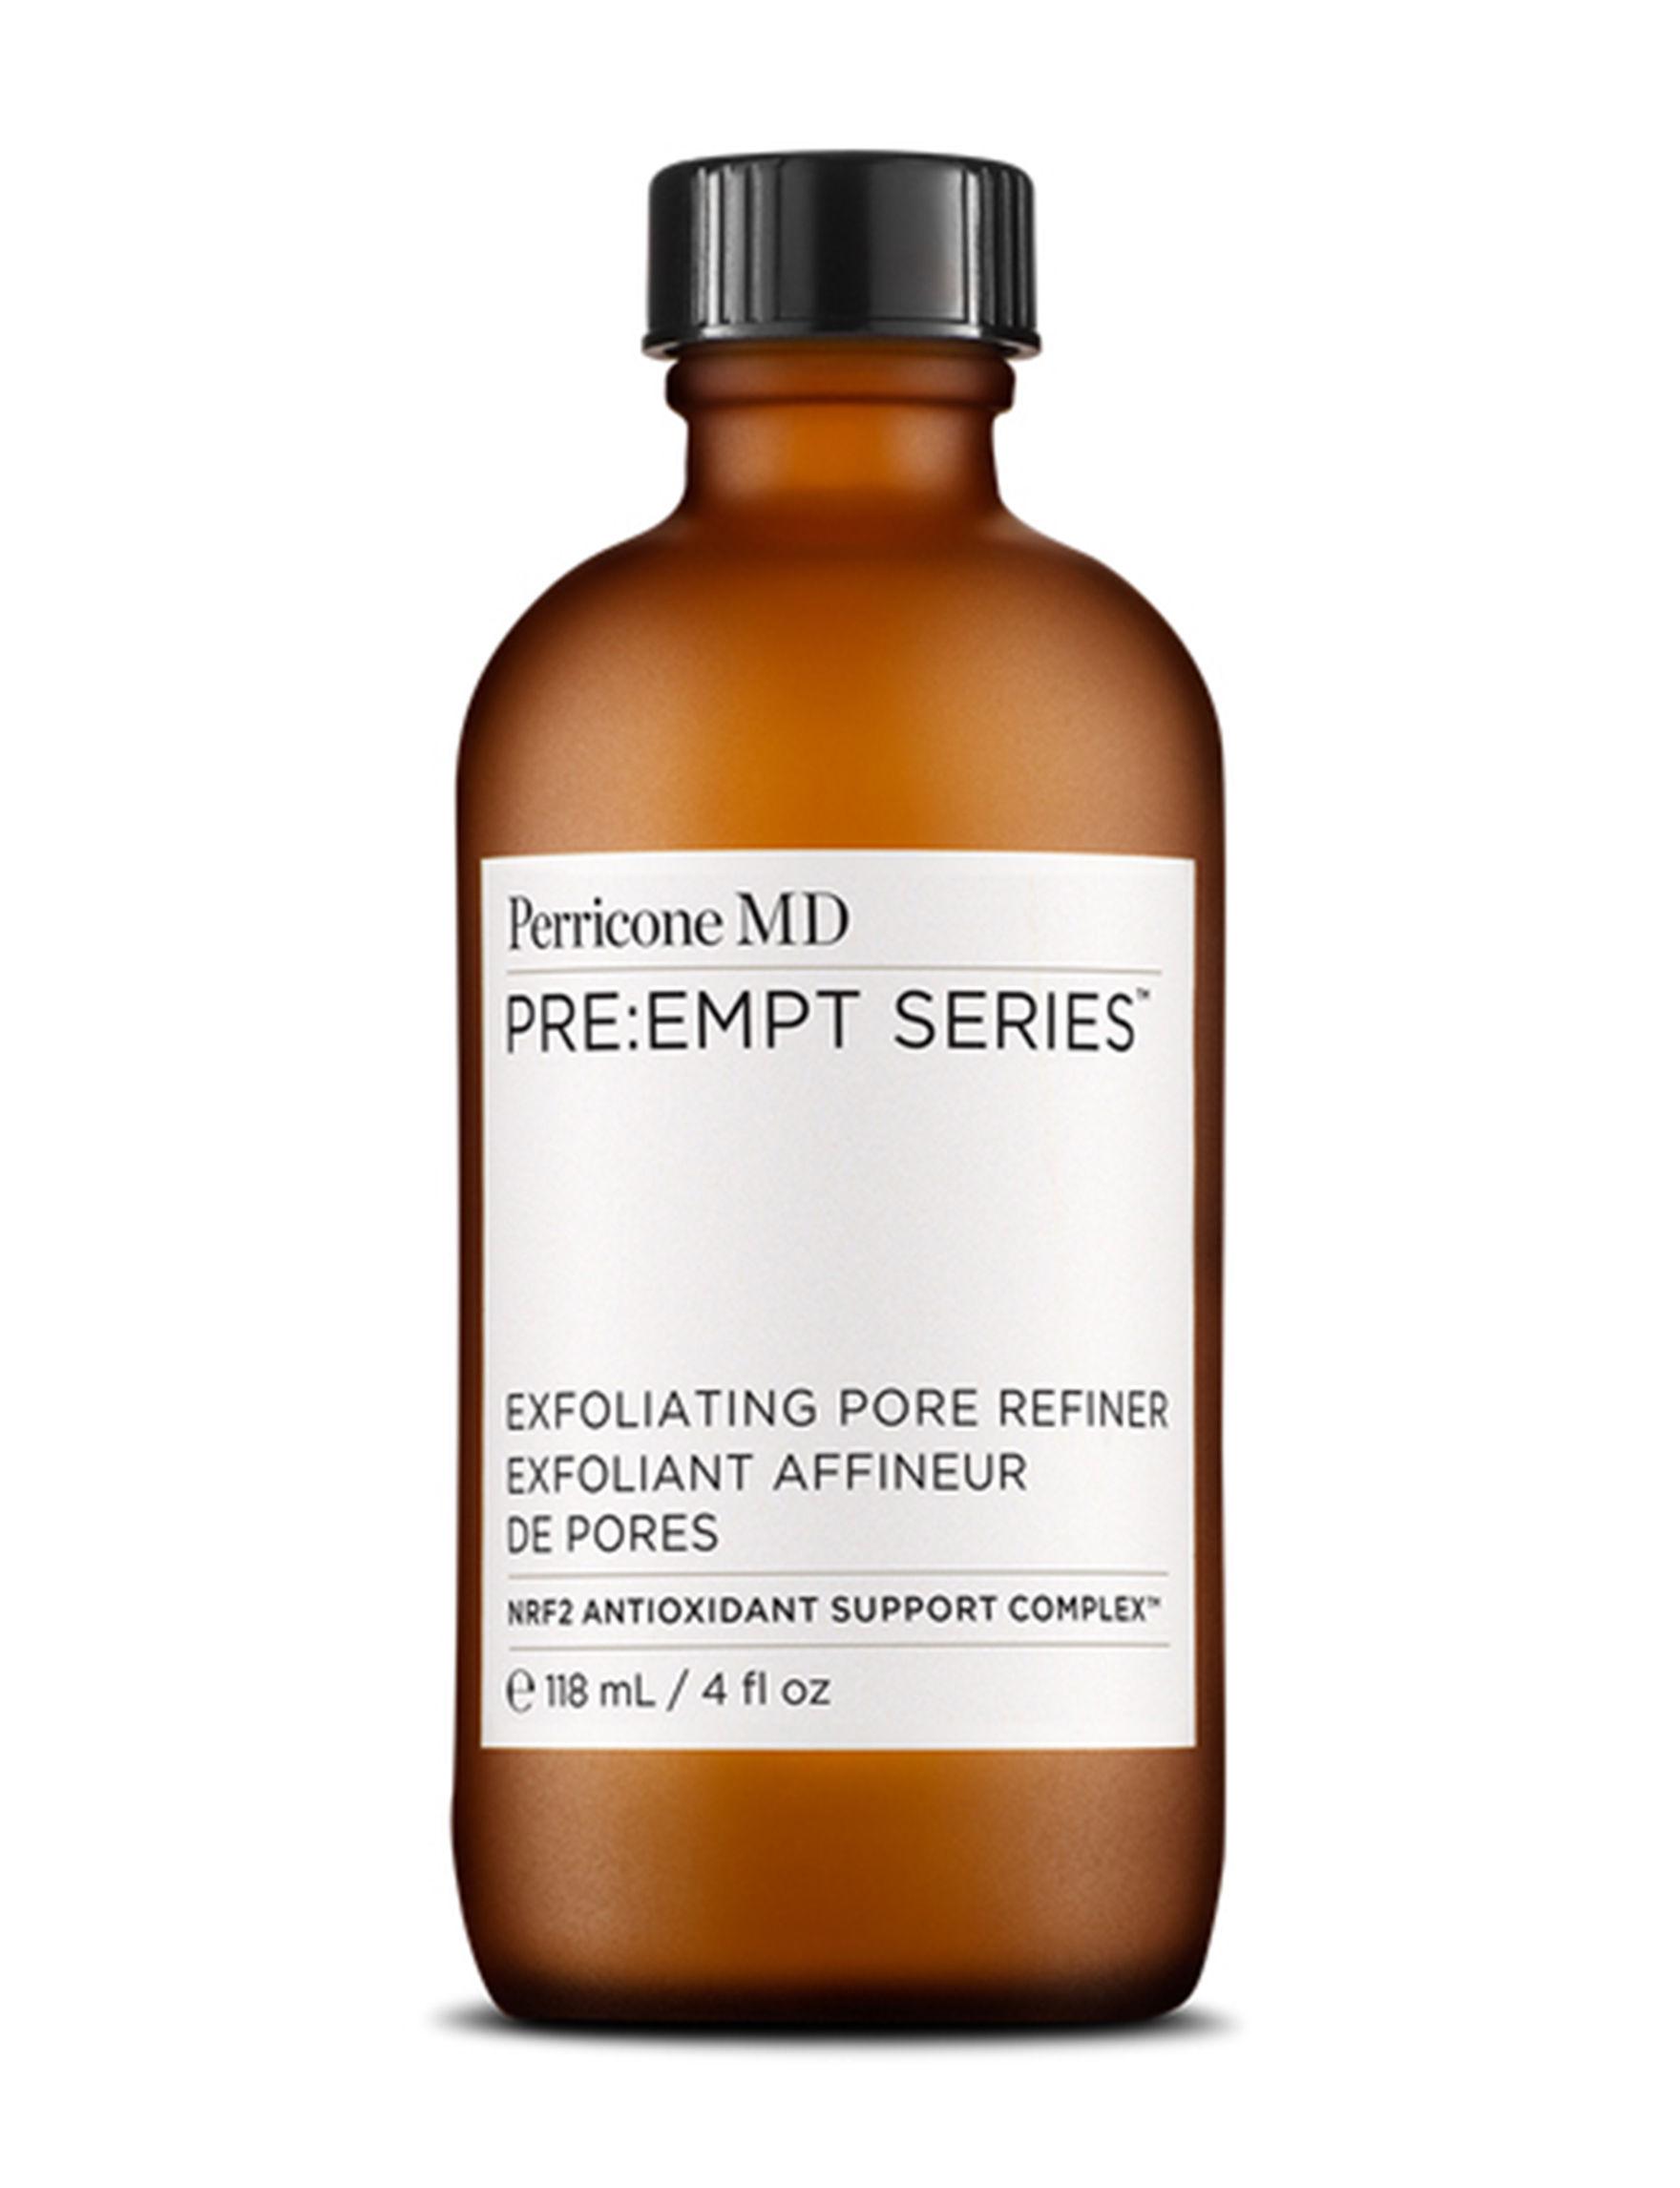 Perricone MD  Cleansers & Toners Exfoliators